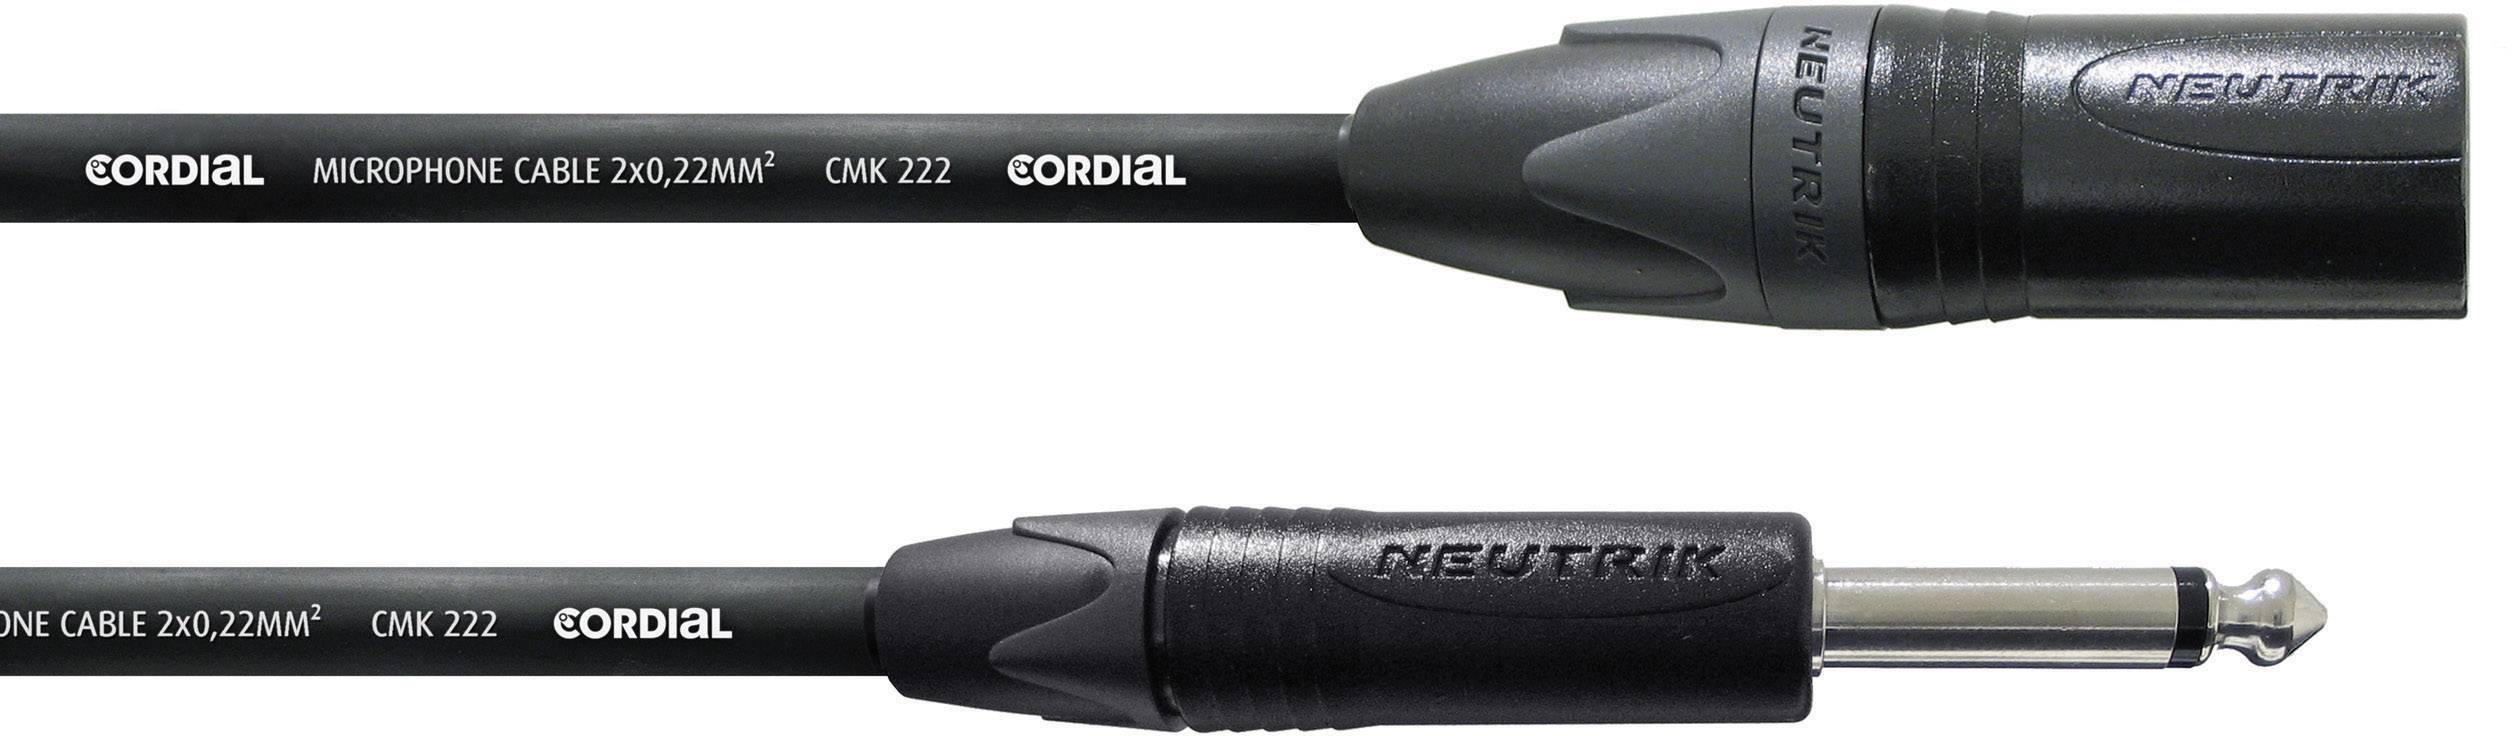 Mikrofónny XLR káblový adaptér Cordial CPM 2,5 MP CPM 2,5 MP, 2.5 m, čierna